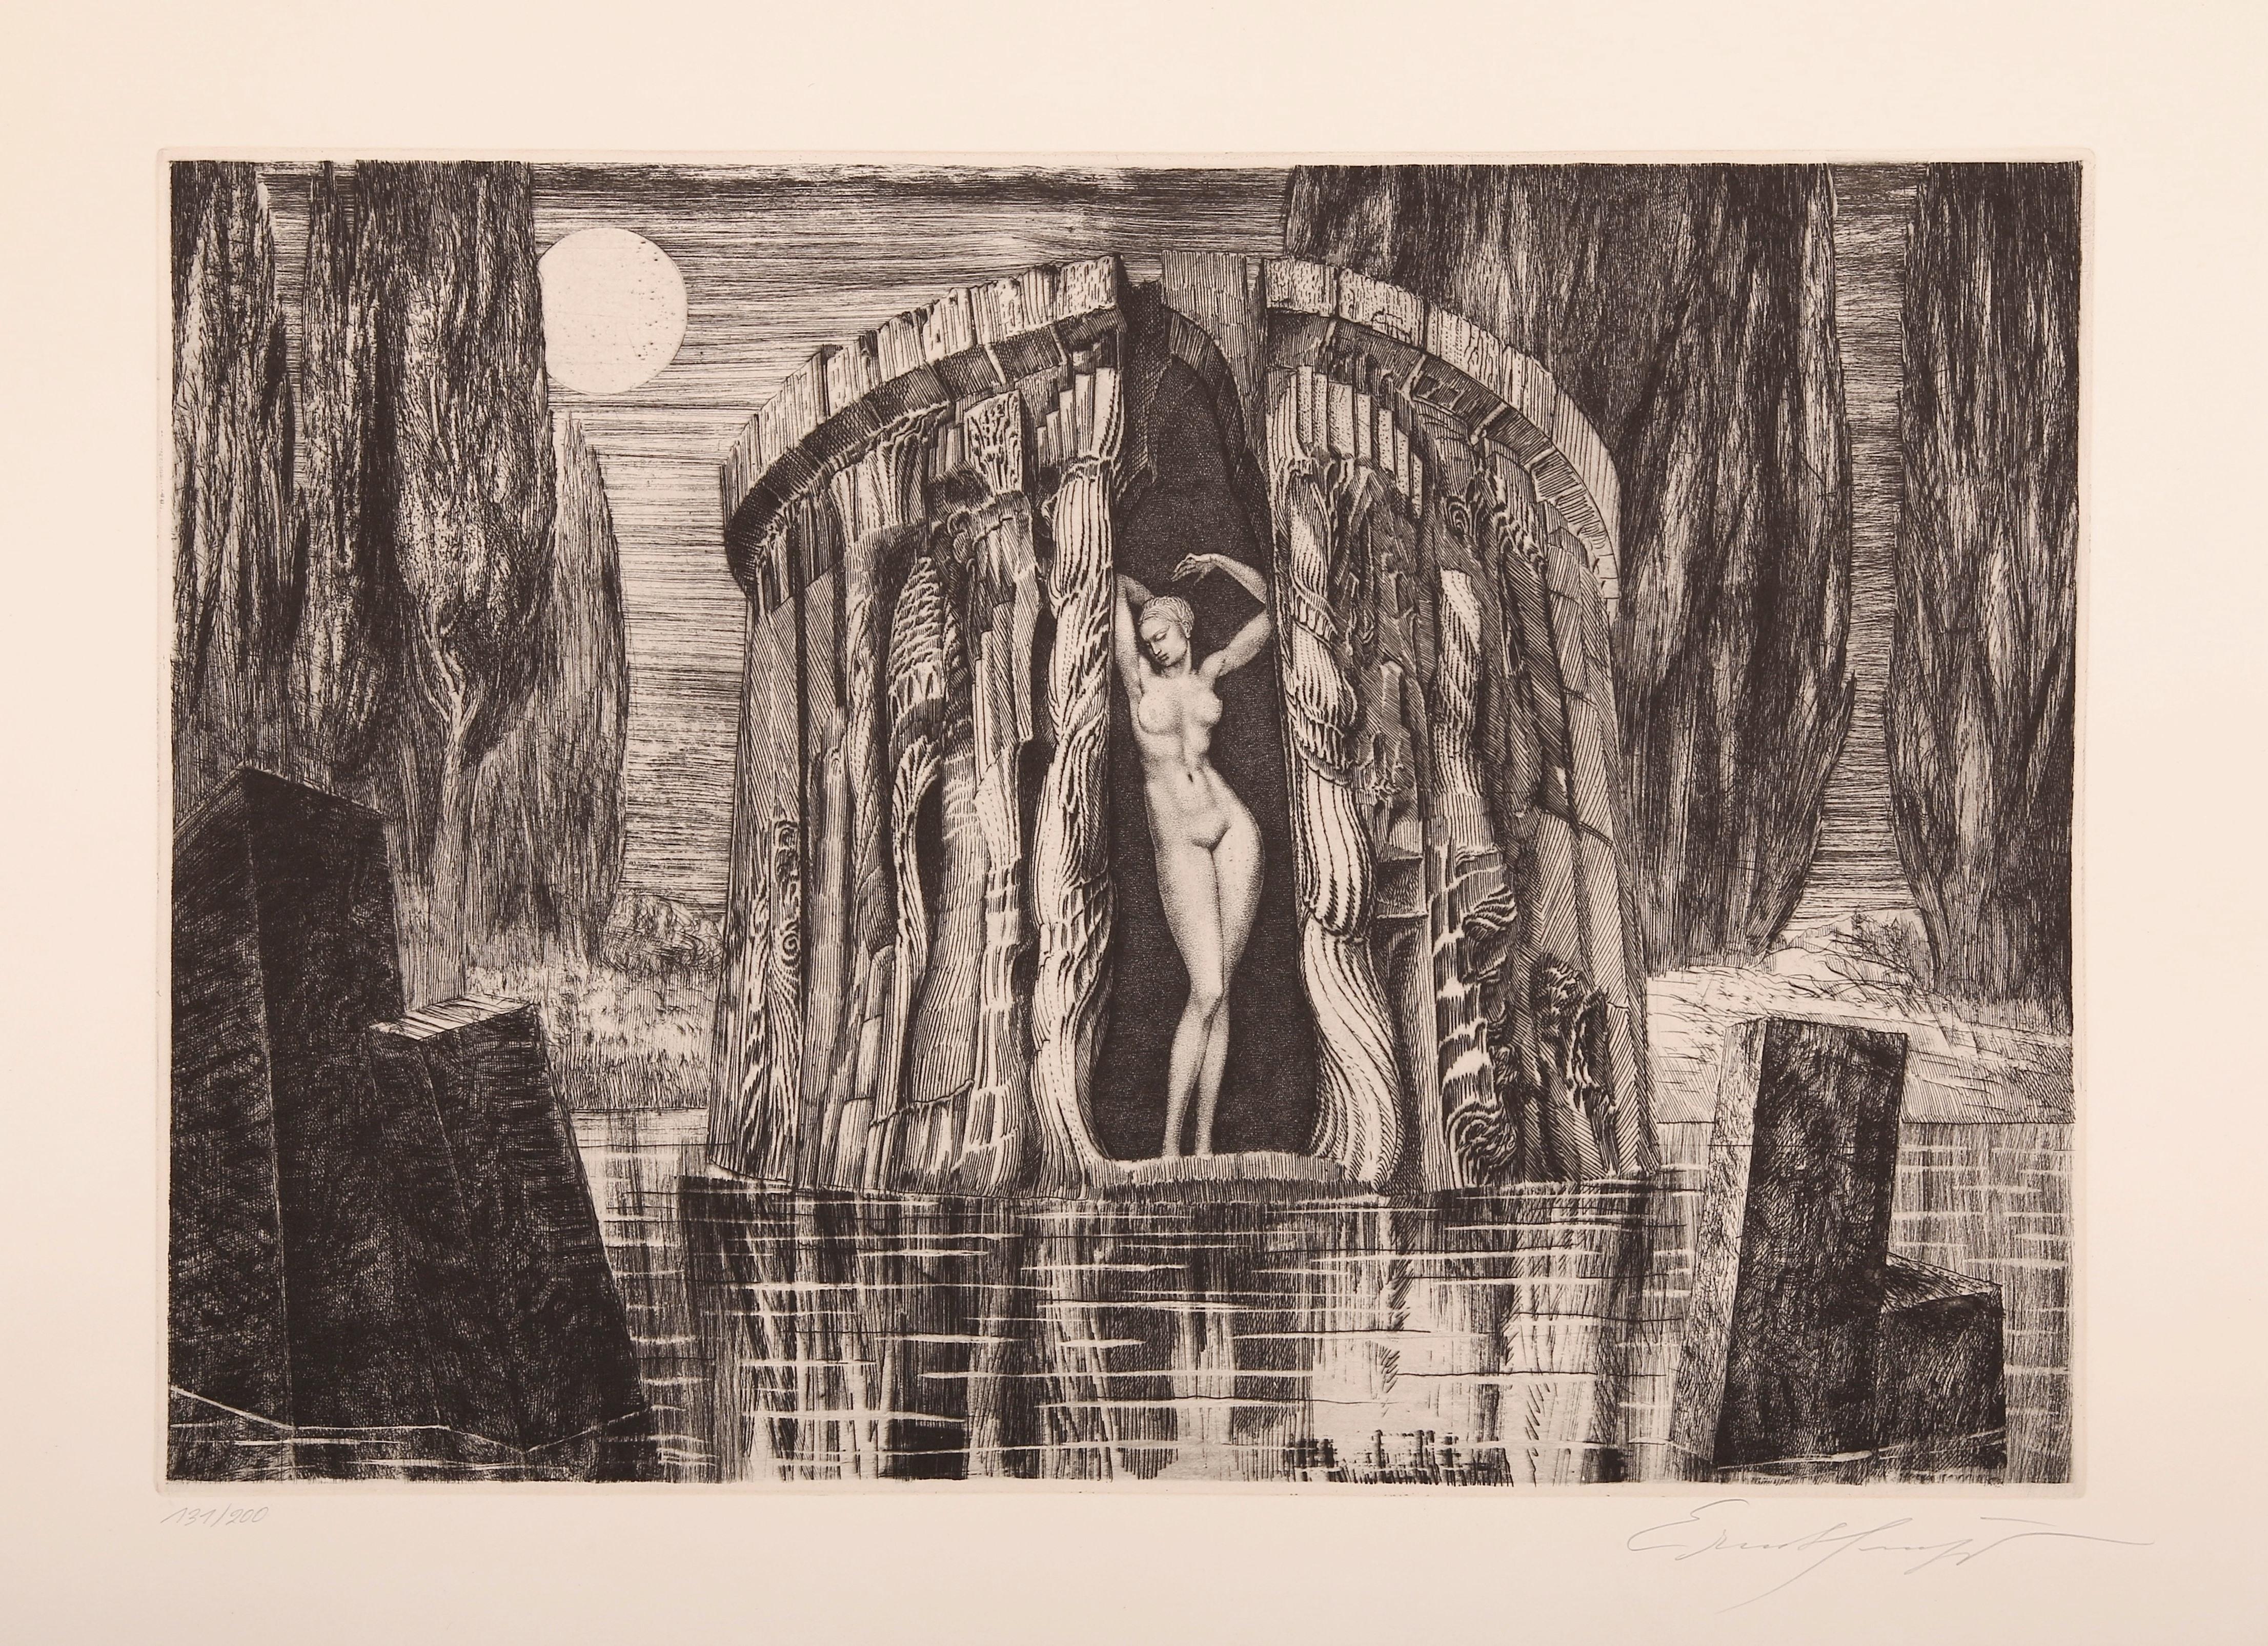 "Ernst Fuchs (Wiedeń 1930-2015), Narodziny Wenus akwaforta na papierze sygn. p.d. ""Ernst Fuchs"", l.d. ""131/200"" Kolekcja Galerii ARTYKWARIAT"